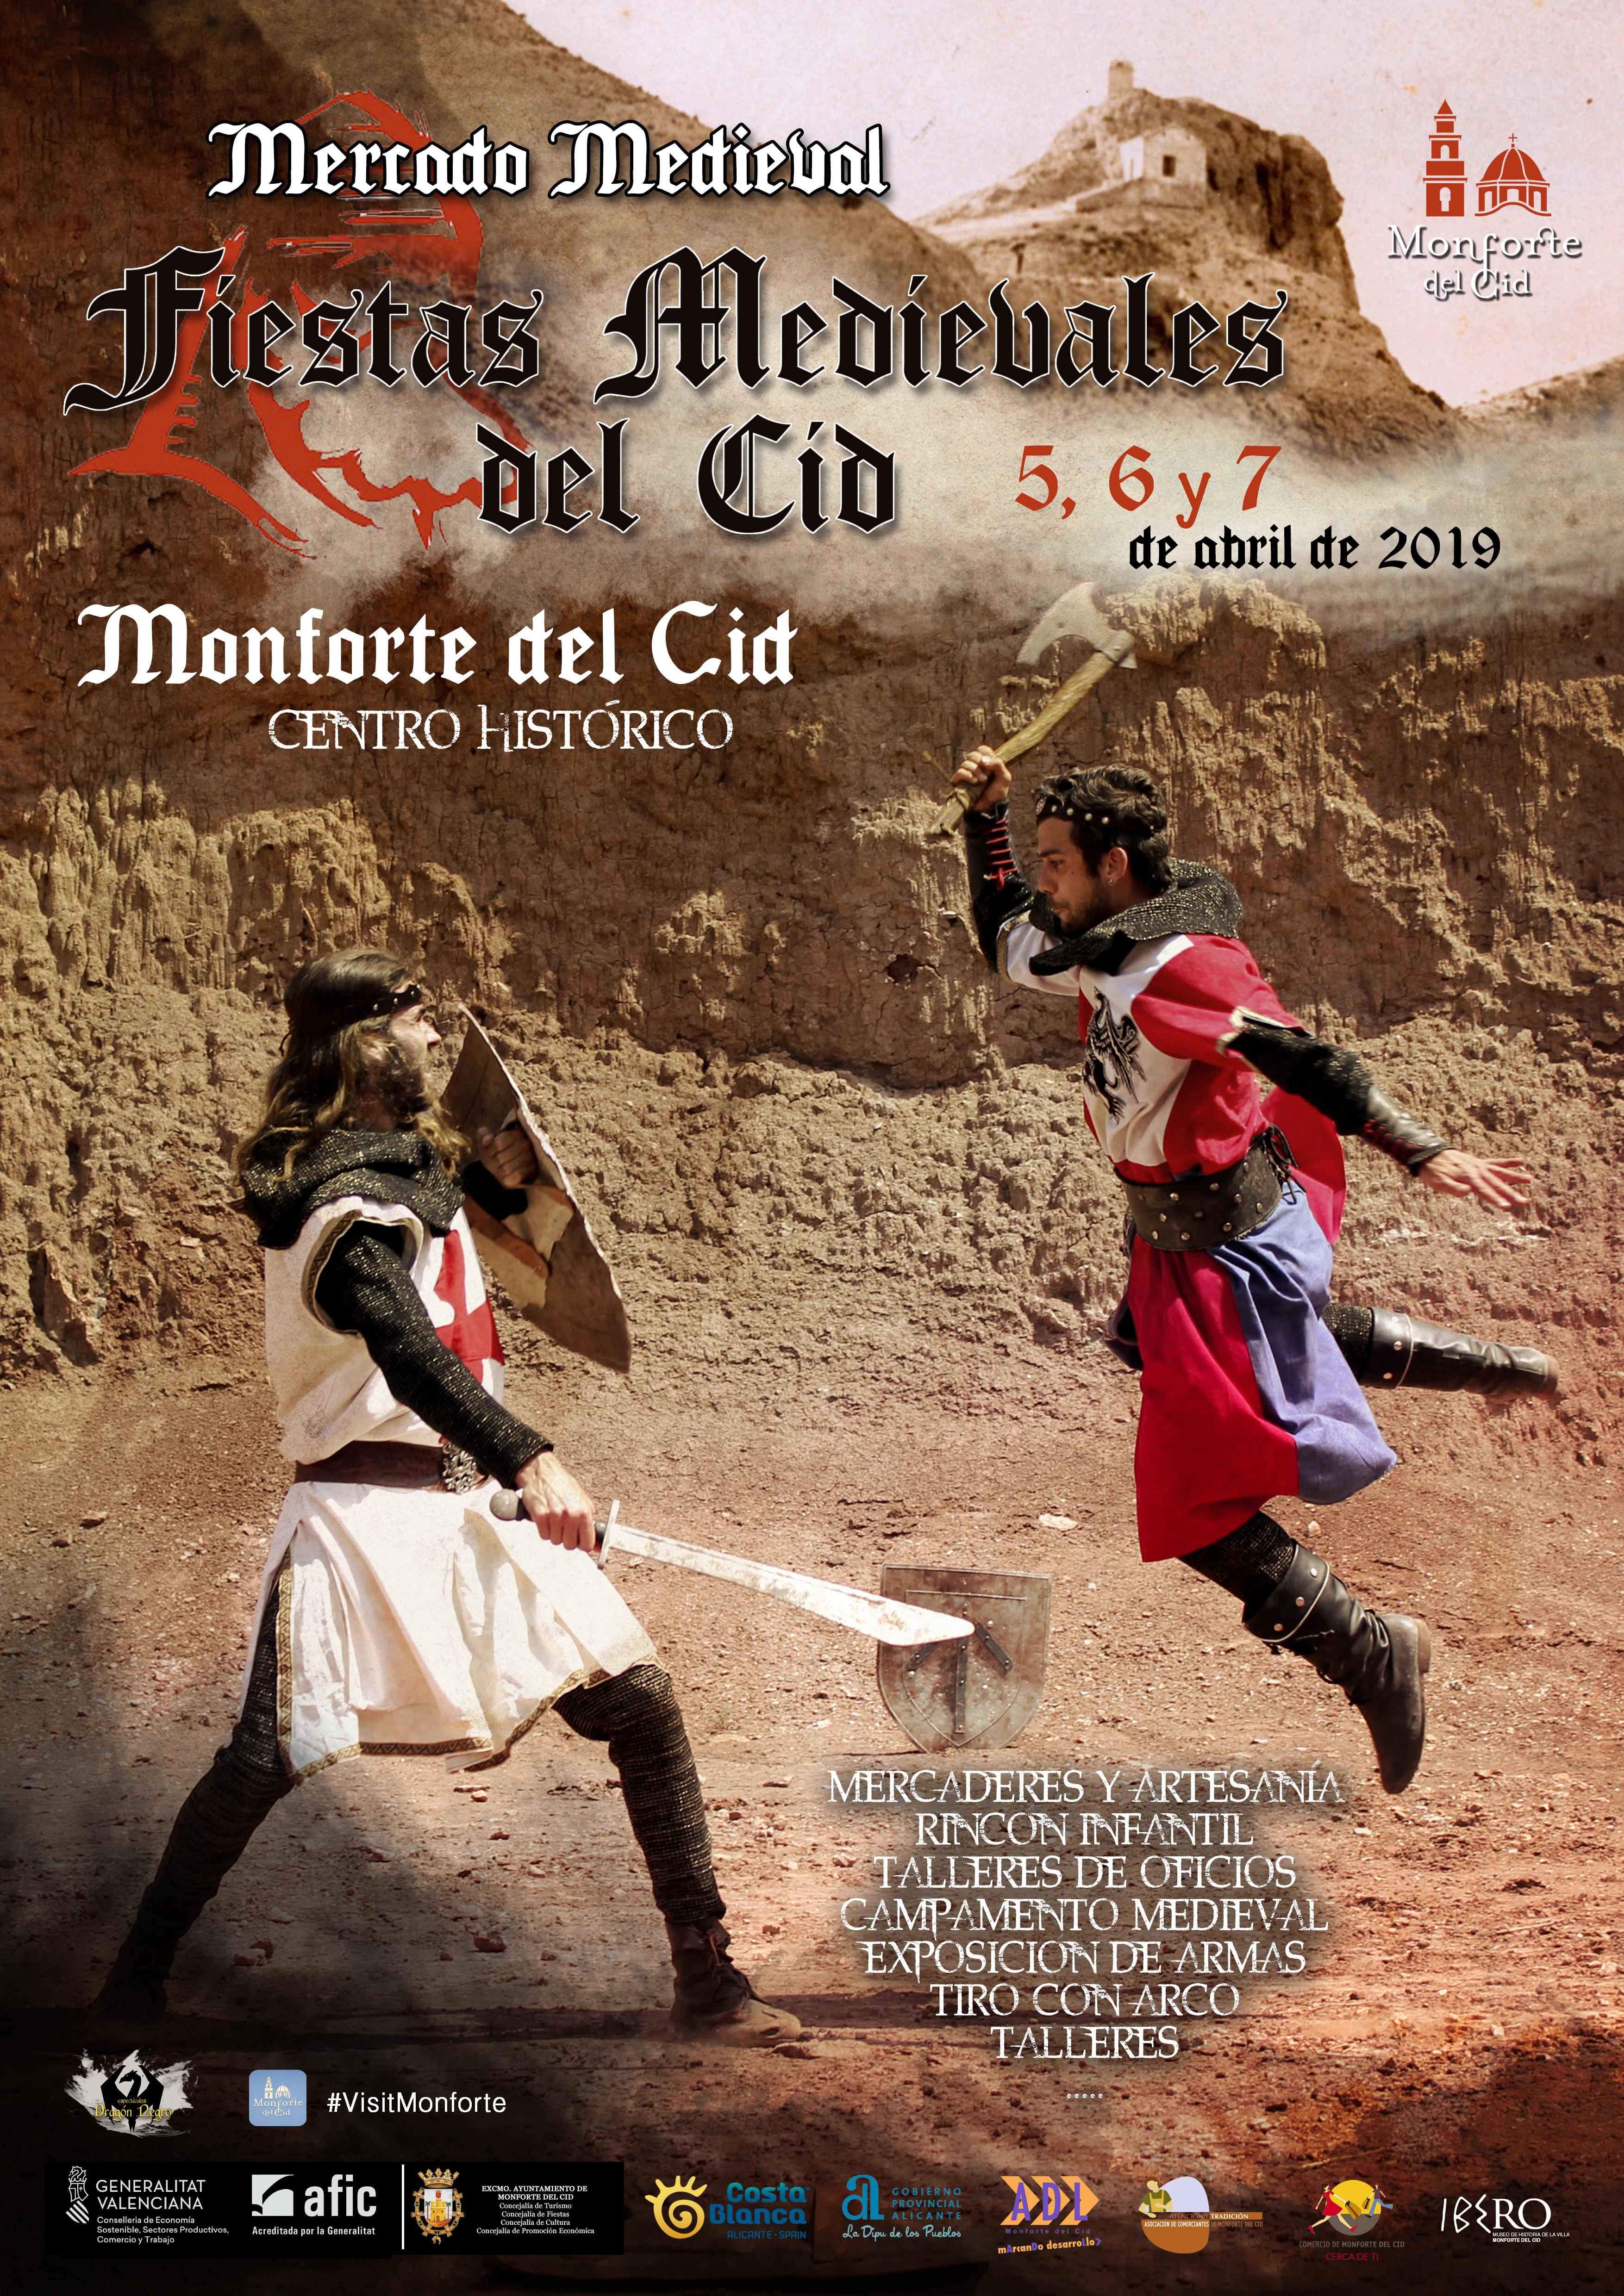 Fiestas Medievales del Cid